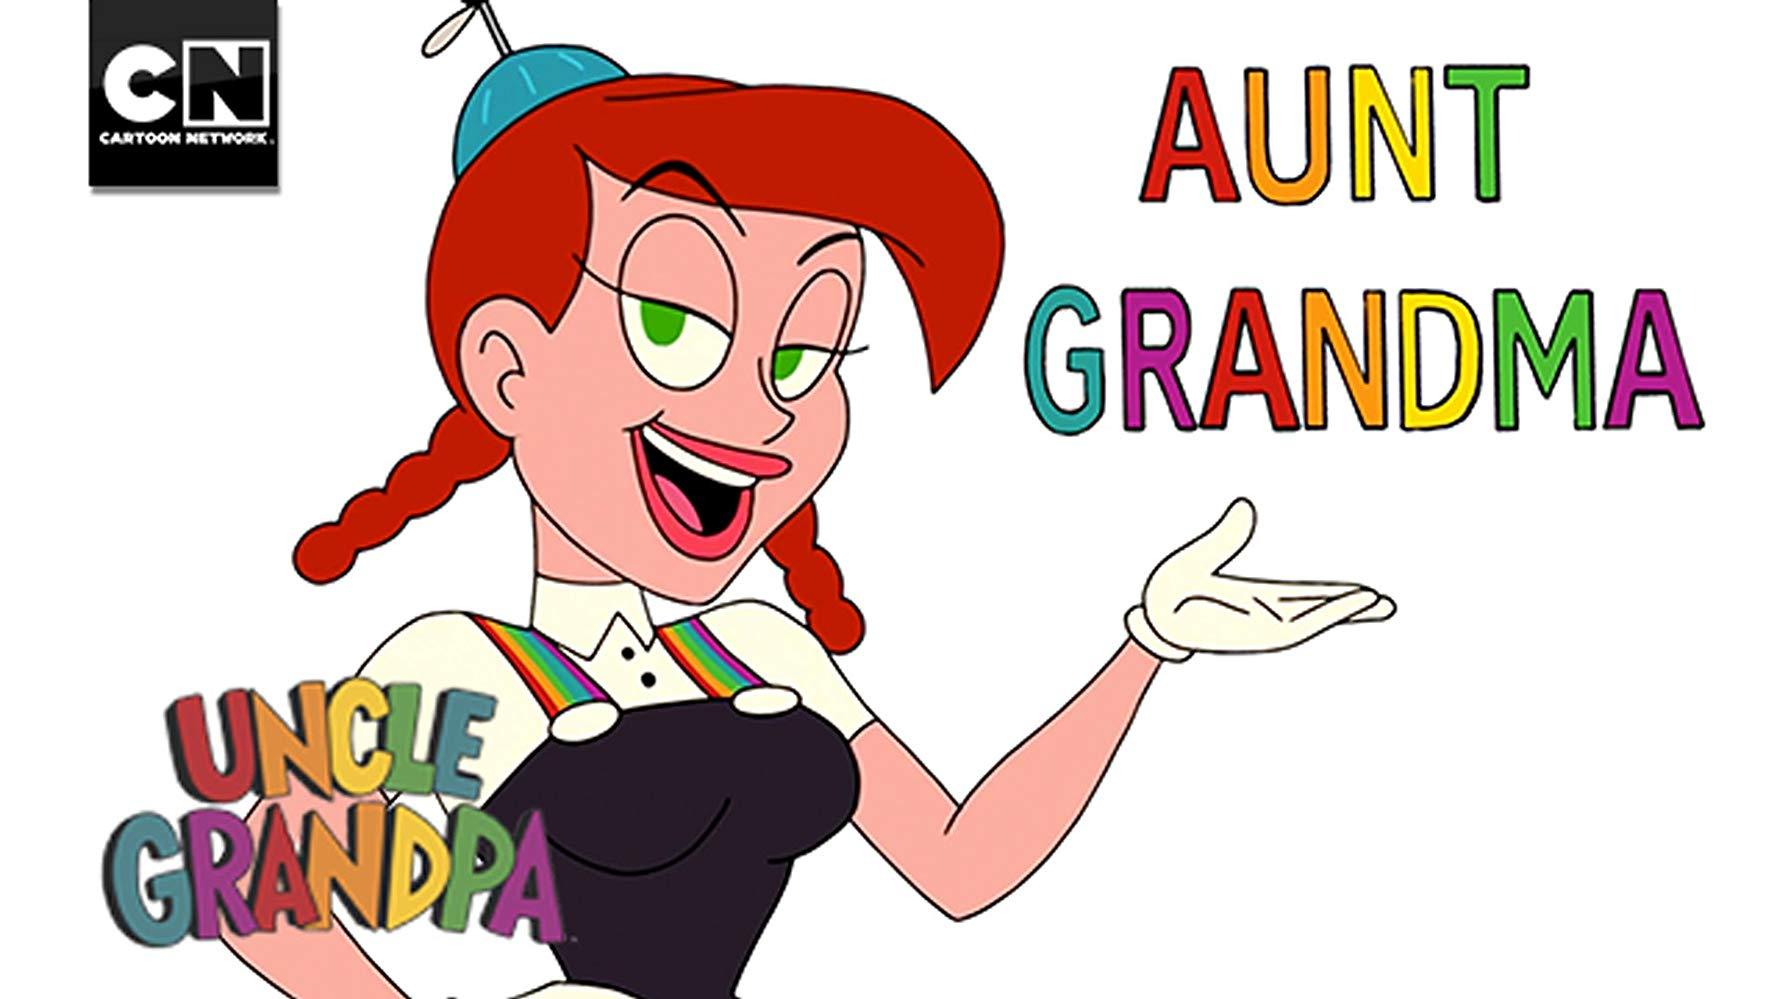 Grandma clipart aunt.